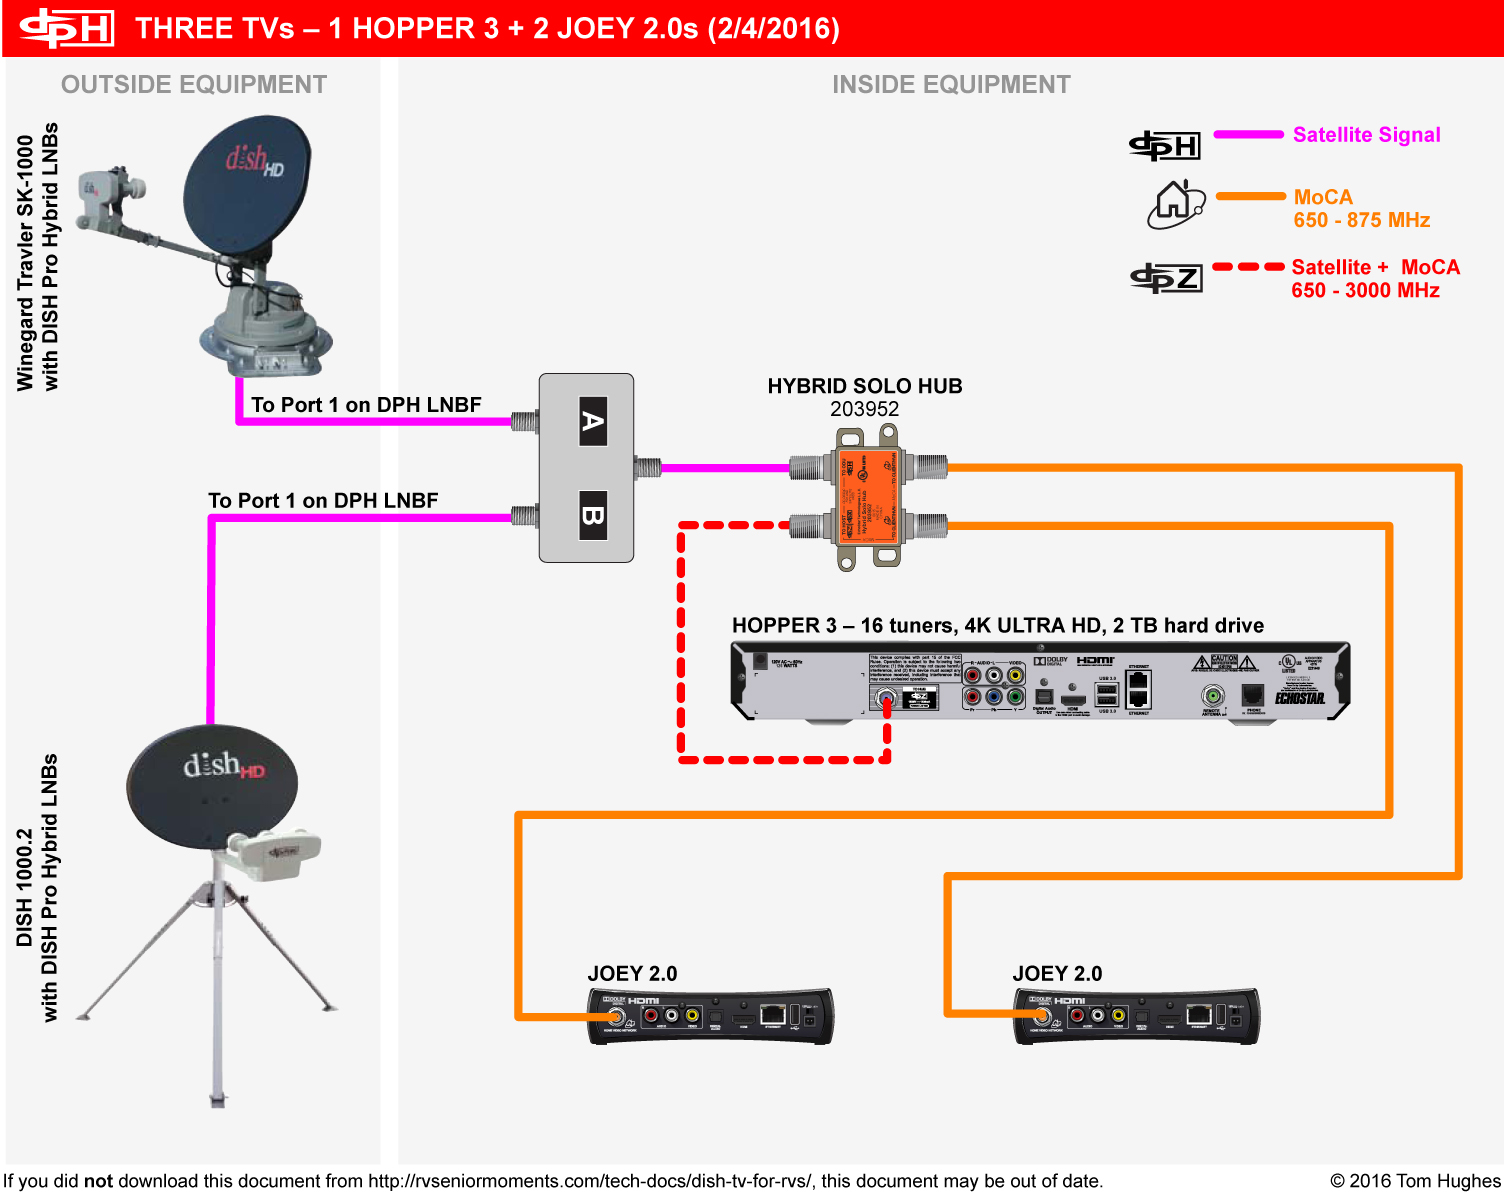 dish network wiring diagram hopper. Black Bedroom Furniture Sets. Home Design Ideas